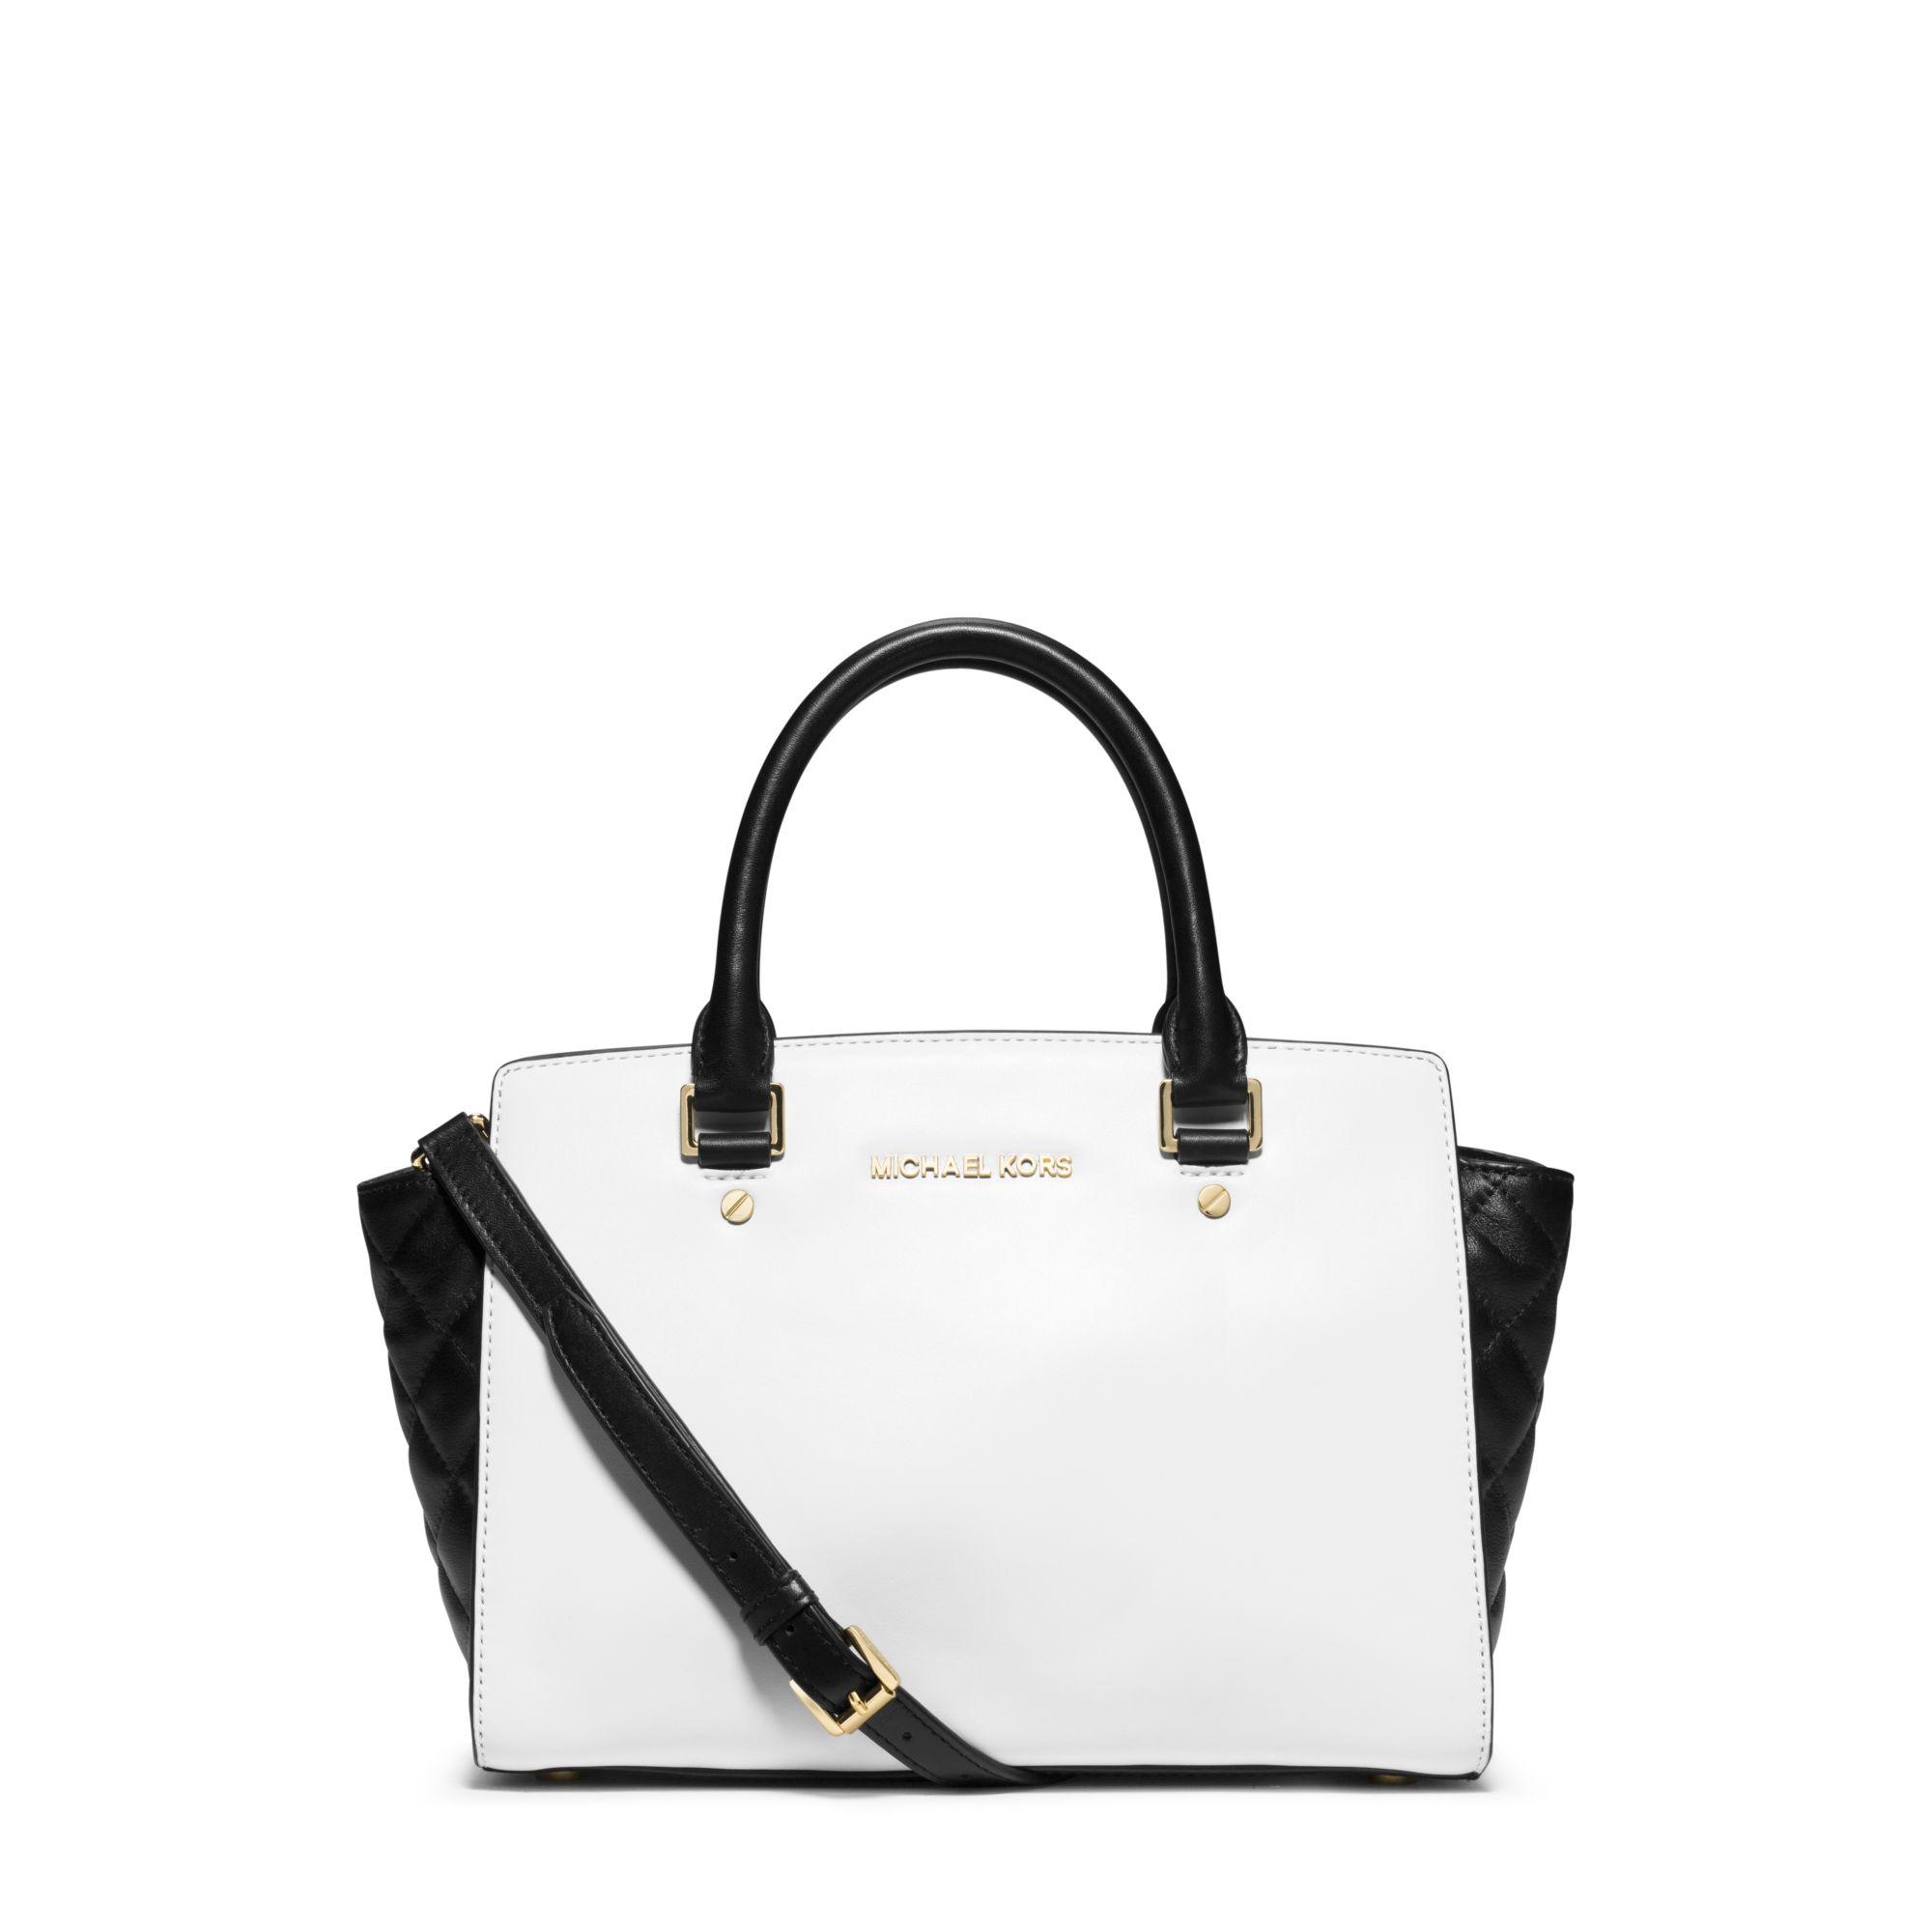 3d5391cee4 Lyst - Michael Kors Selma Medium Color-block Leather Satchel in White